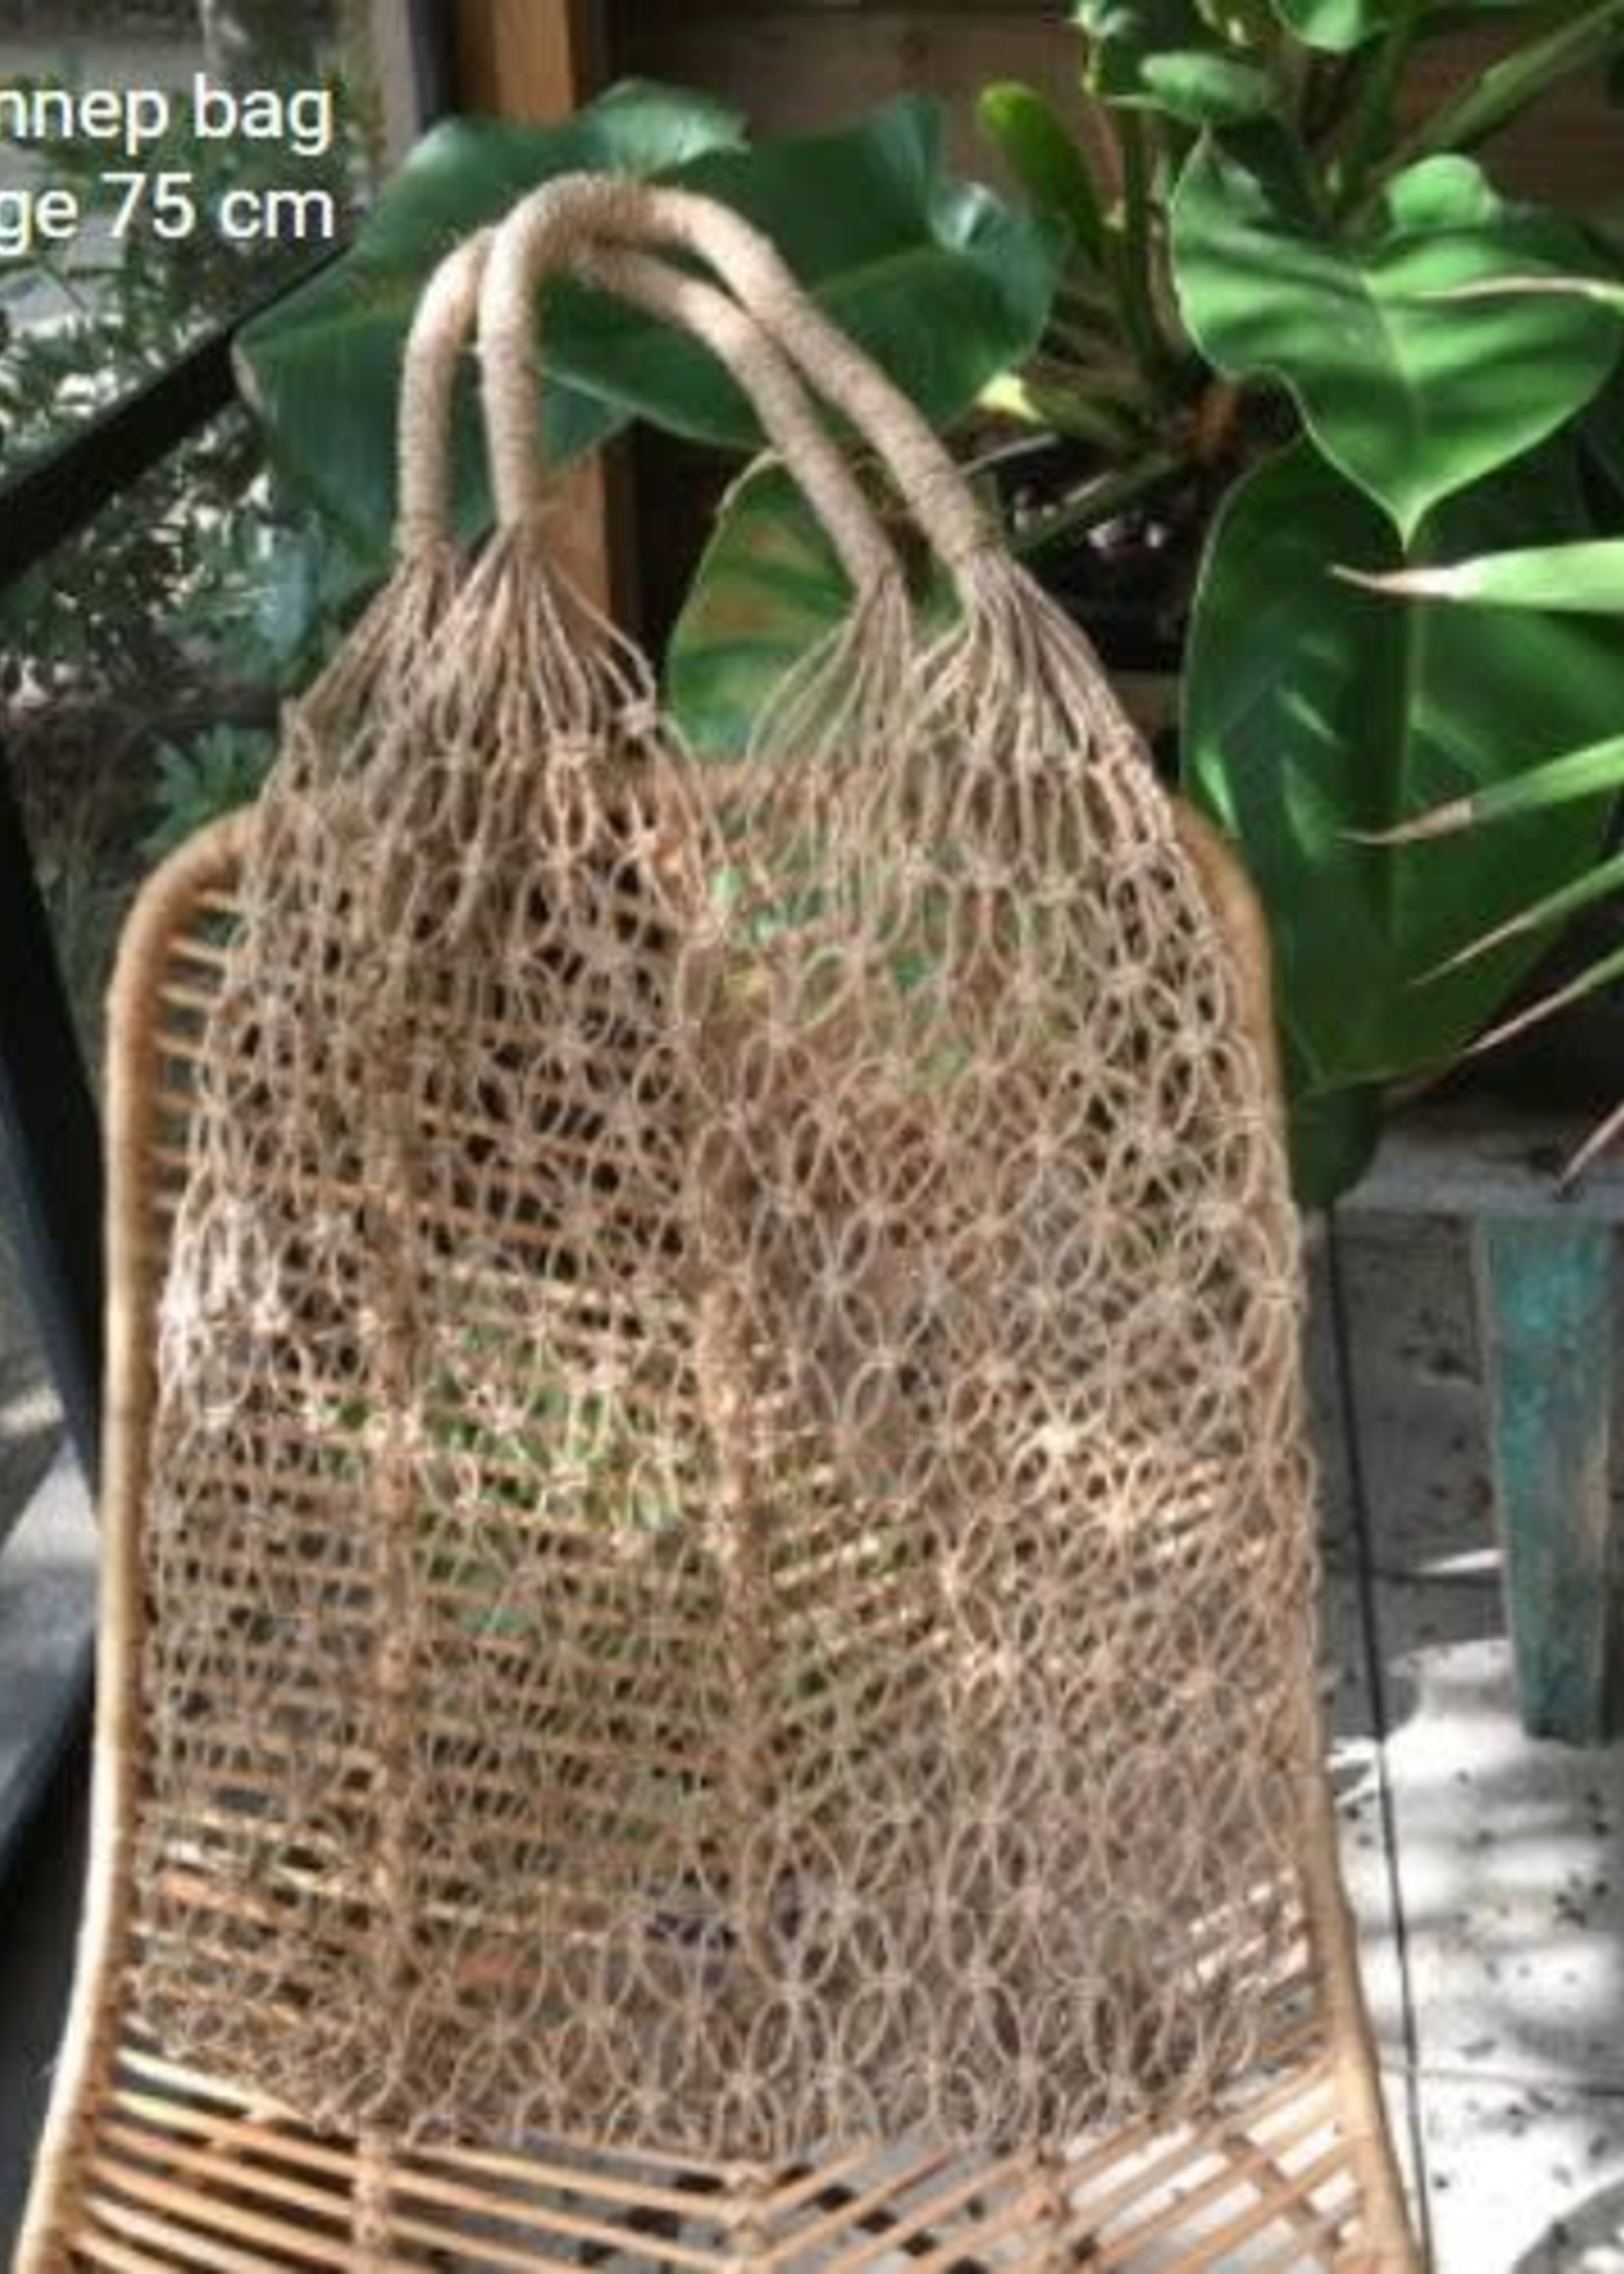 handgemaakte tas van hennep